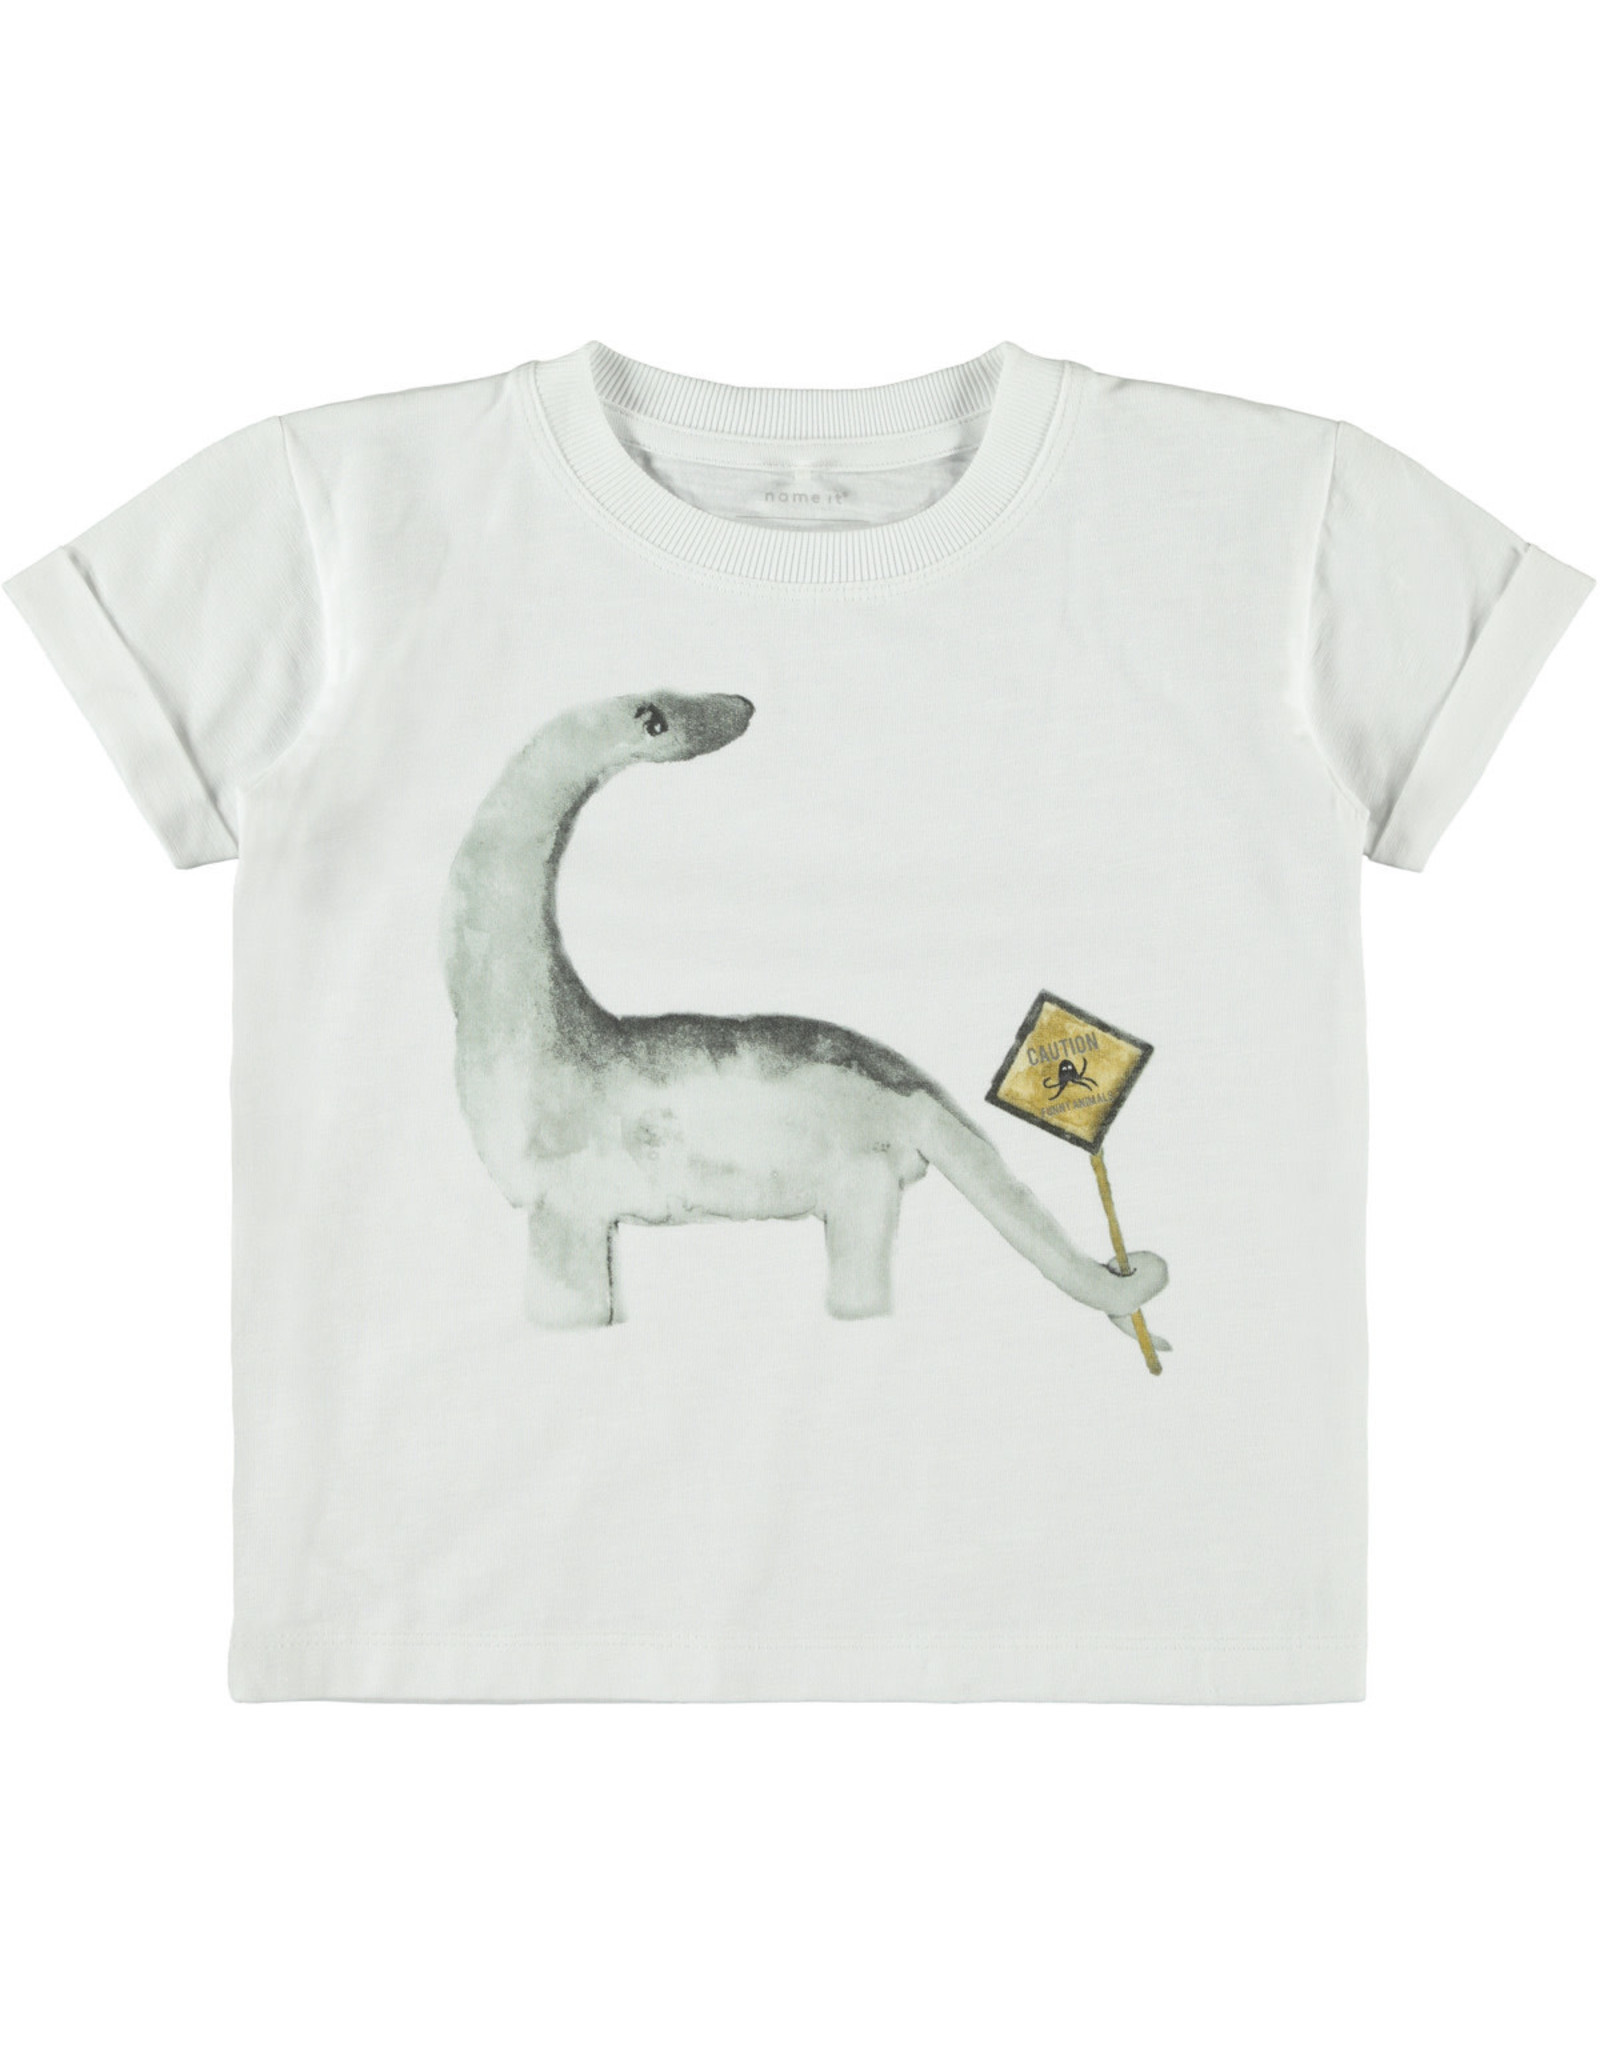 Name It Witte t-shirt met dino